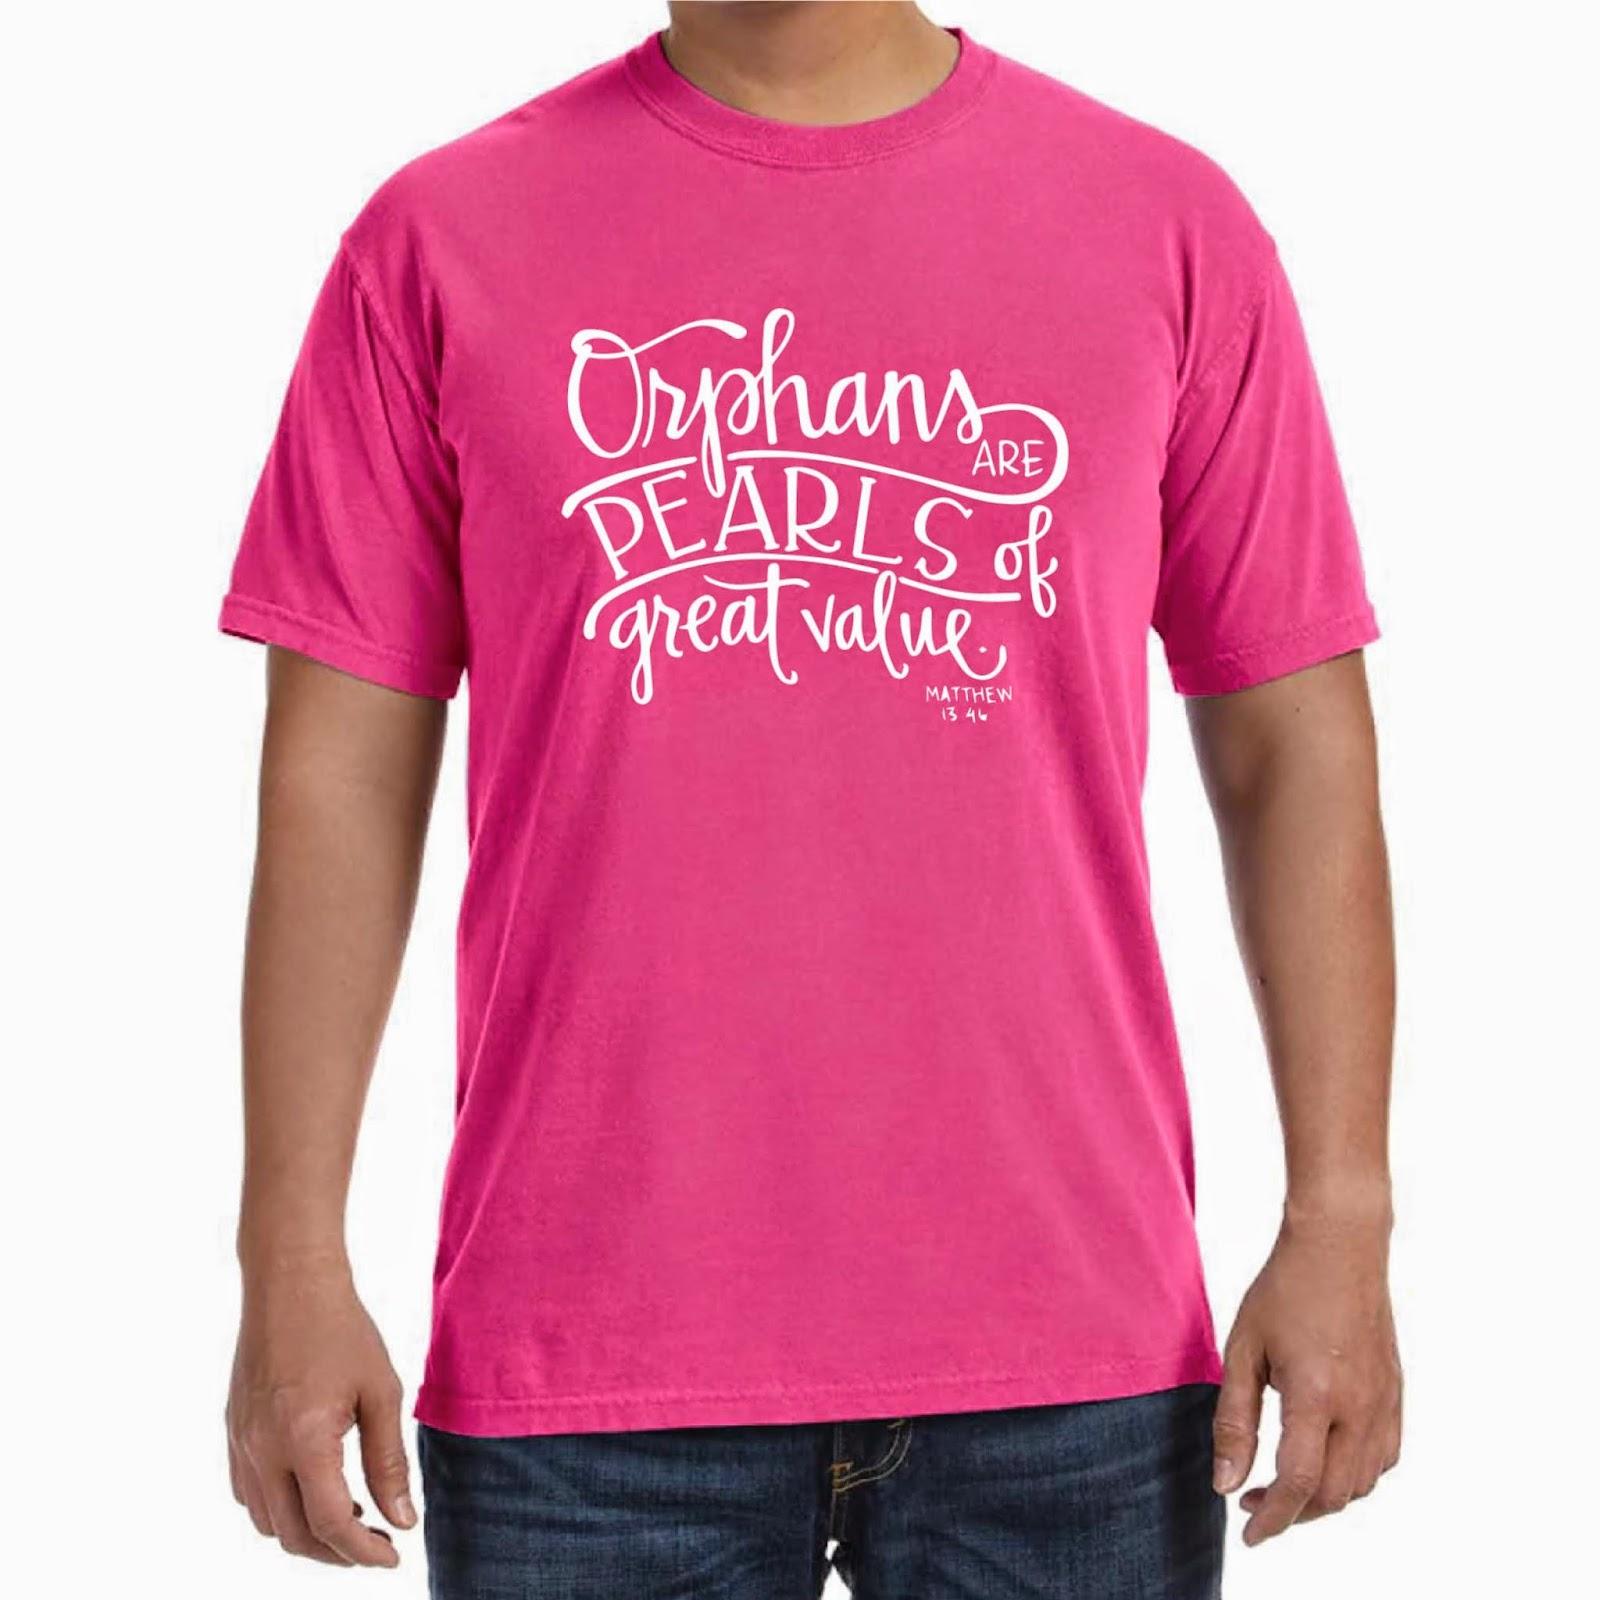 Adoption shirts fundraiser